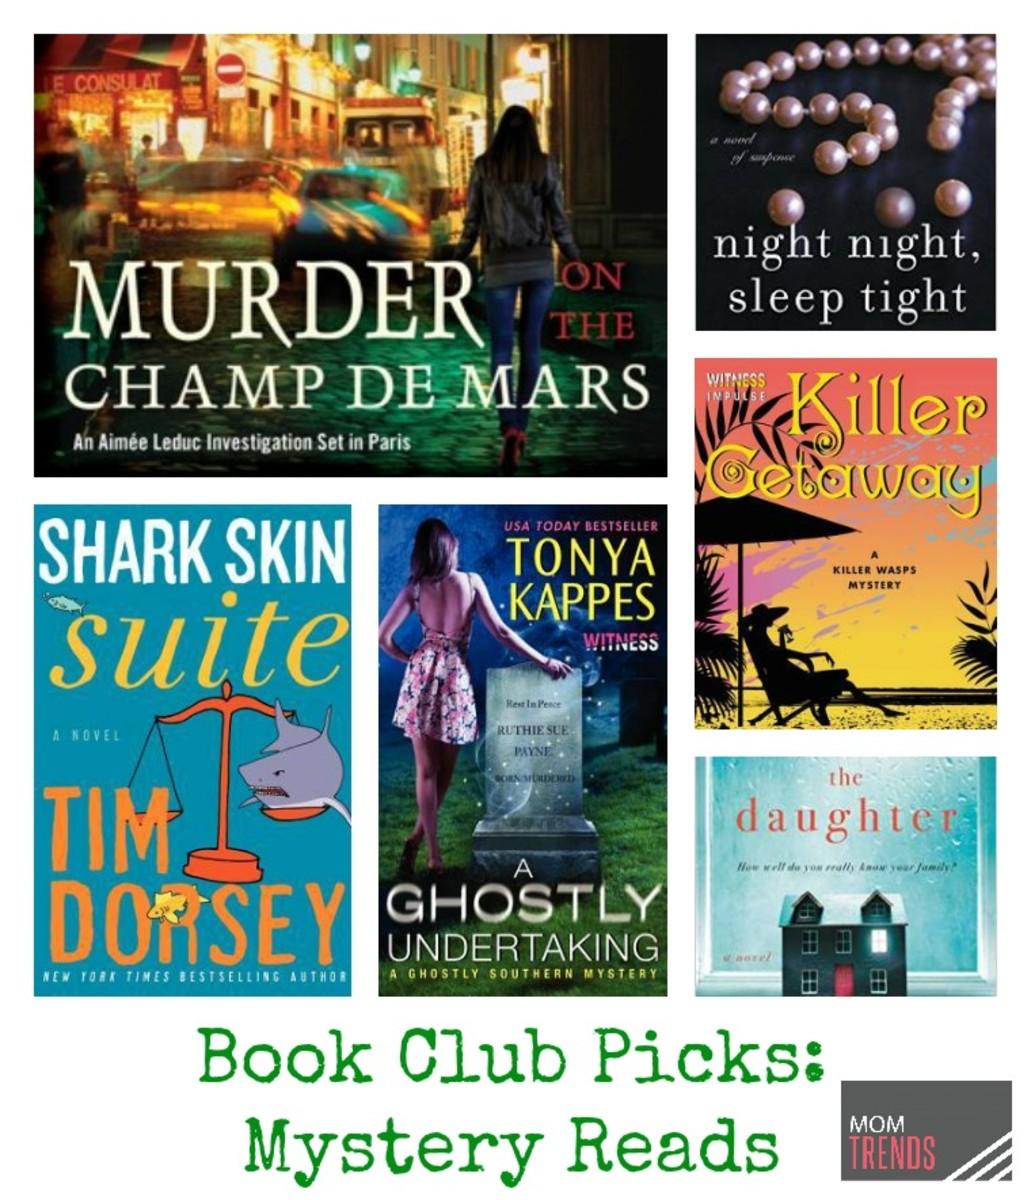 Book Club Picks: Mystery Reads